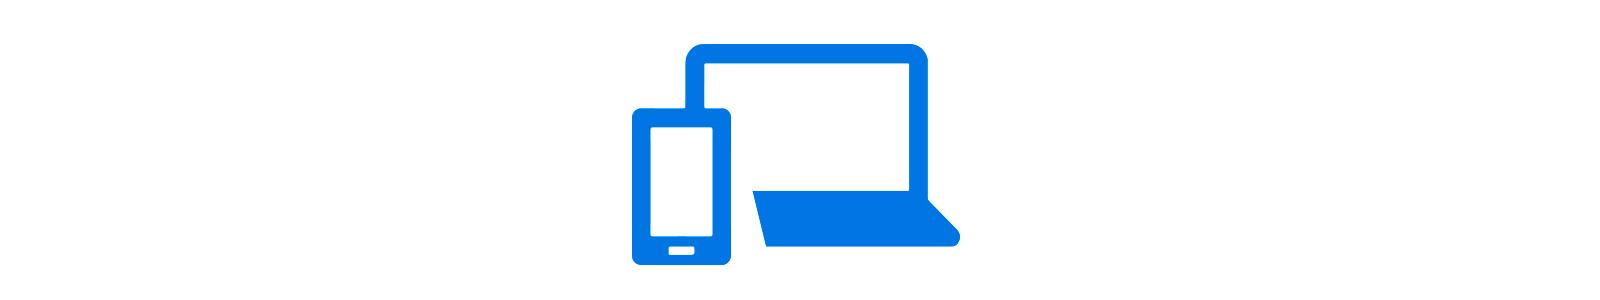 Icona di Continuum per smartphone